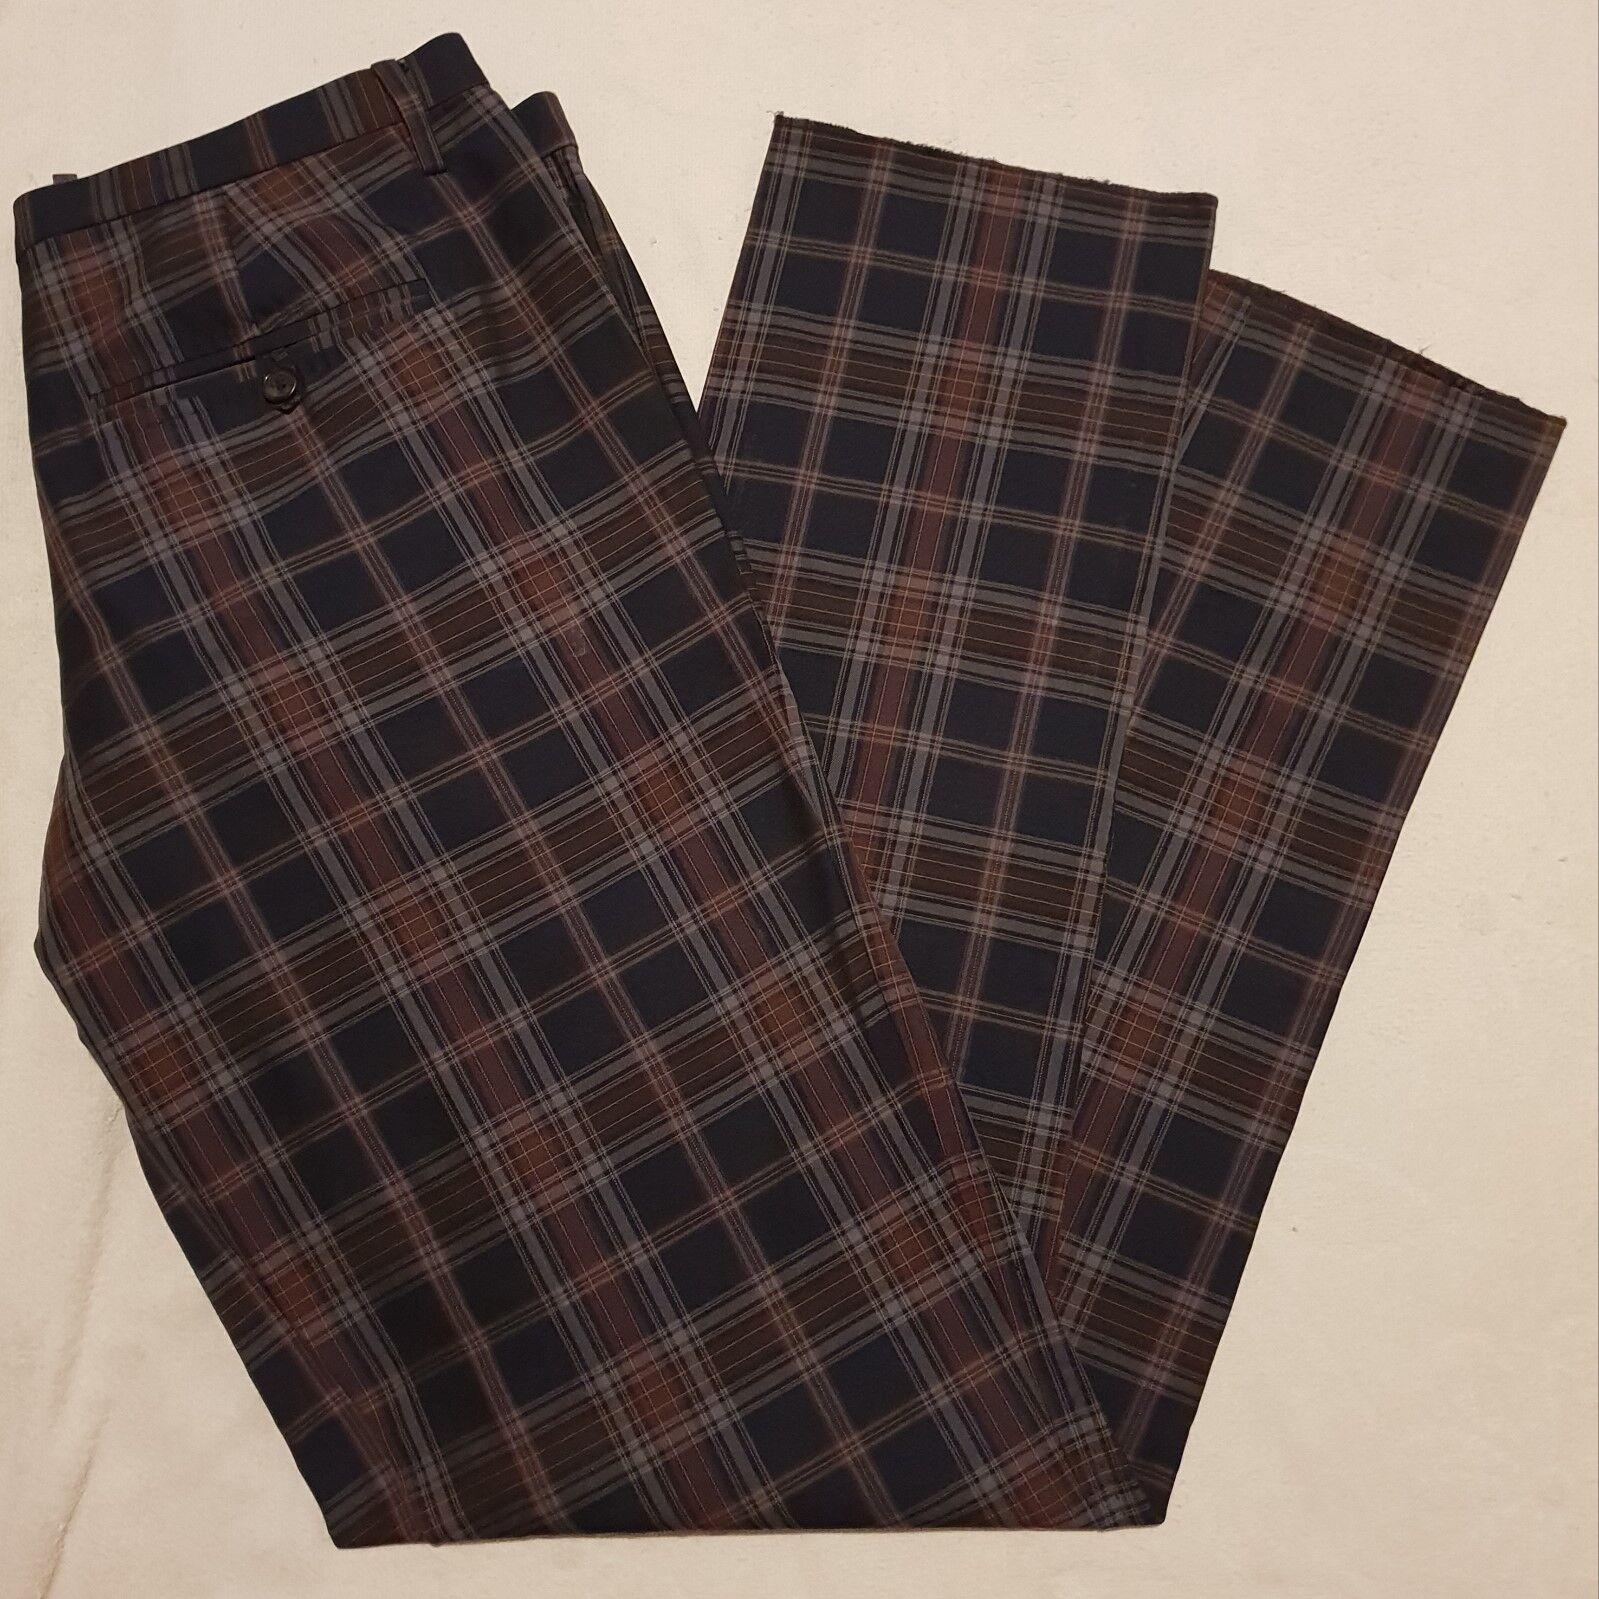 DSQUARED2 PANTALONES A CUADROS size 48 TROUSERS PANTS